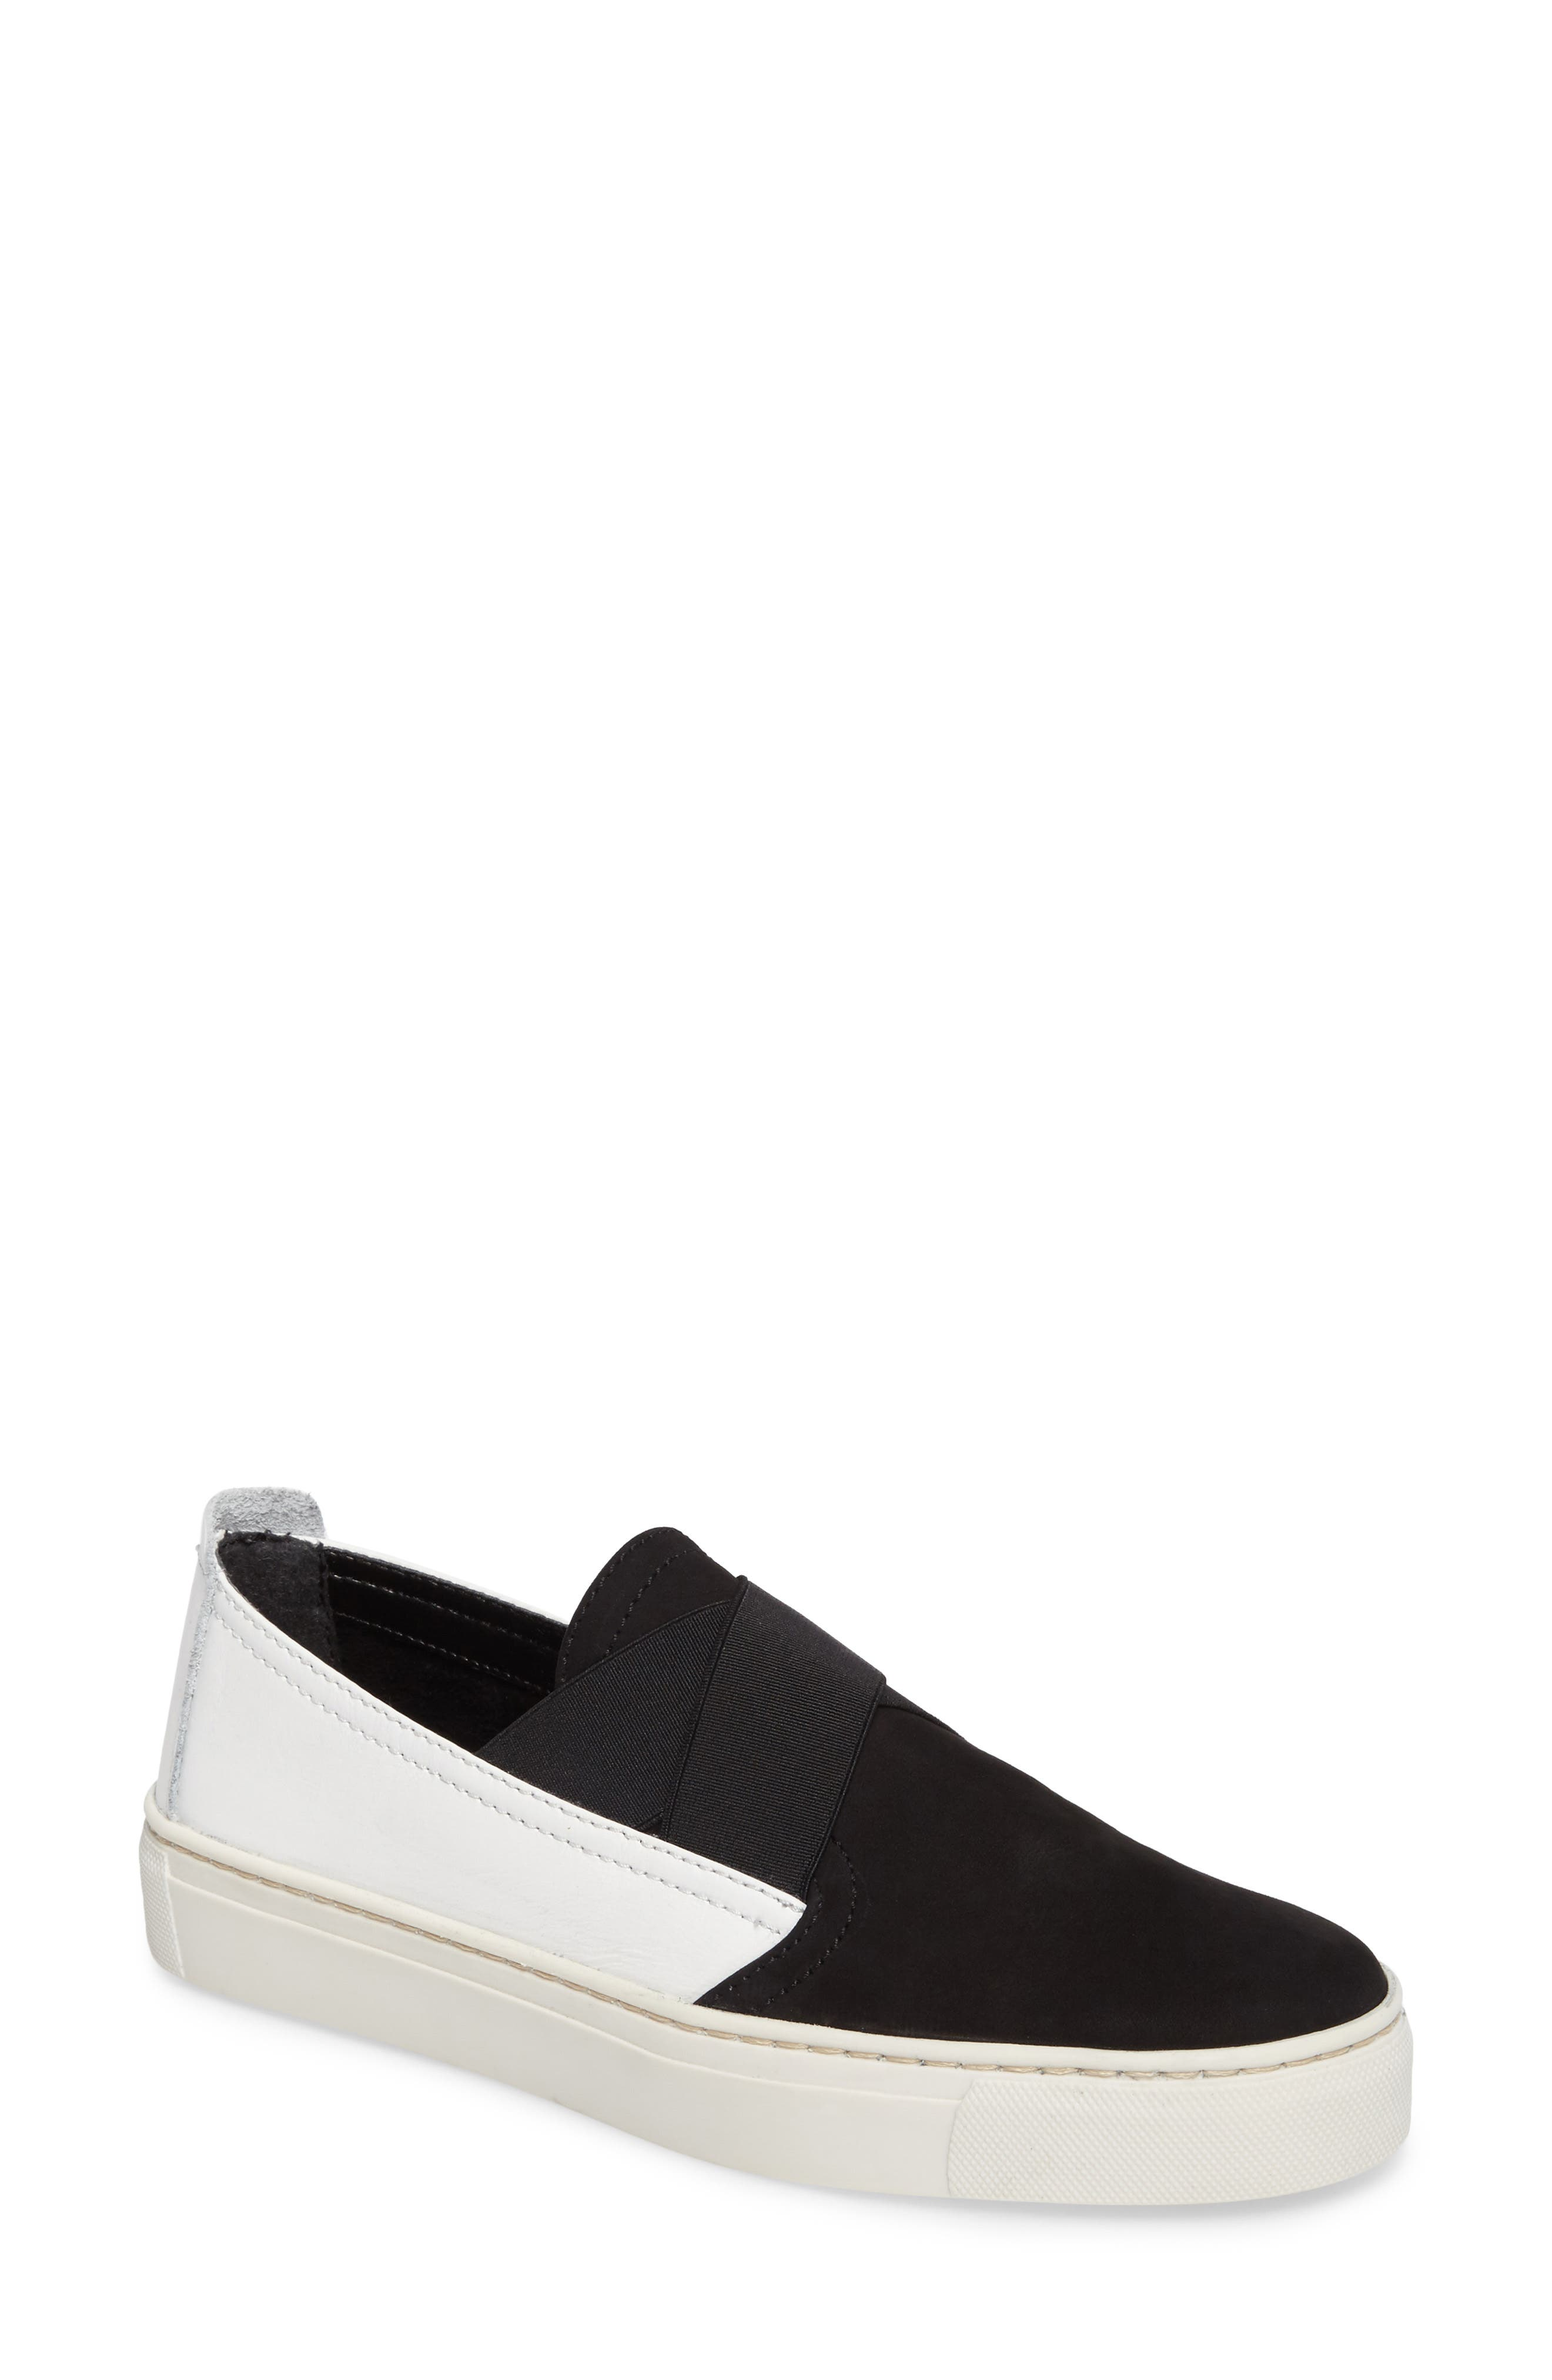 Alternate Image 1 Selected - The FLEXX La Cross Slip-On Sneaker (Women)